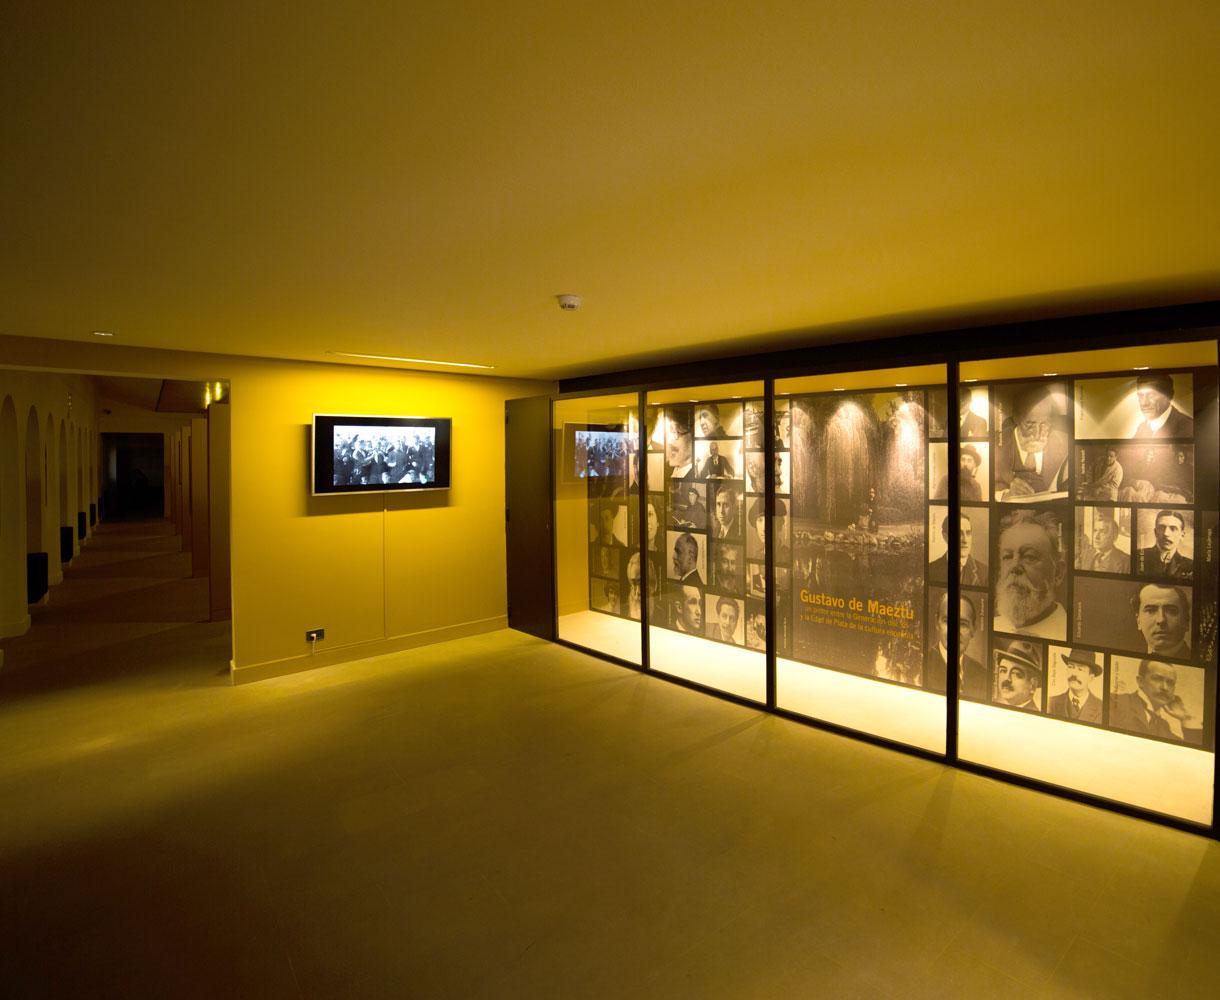 Sala 5 Museo Gustavo de Maeztu. Estella-Lizarra